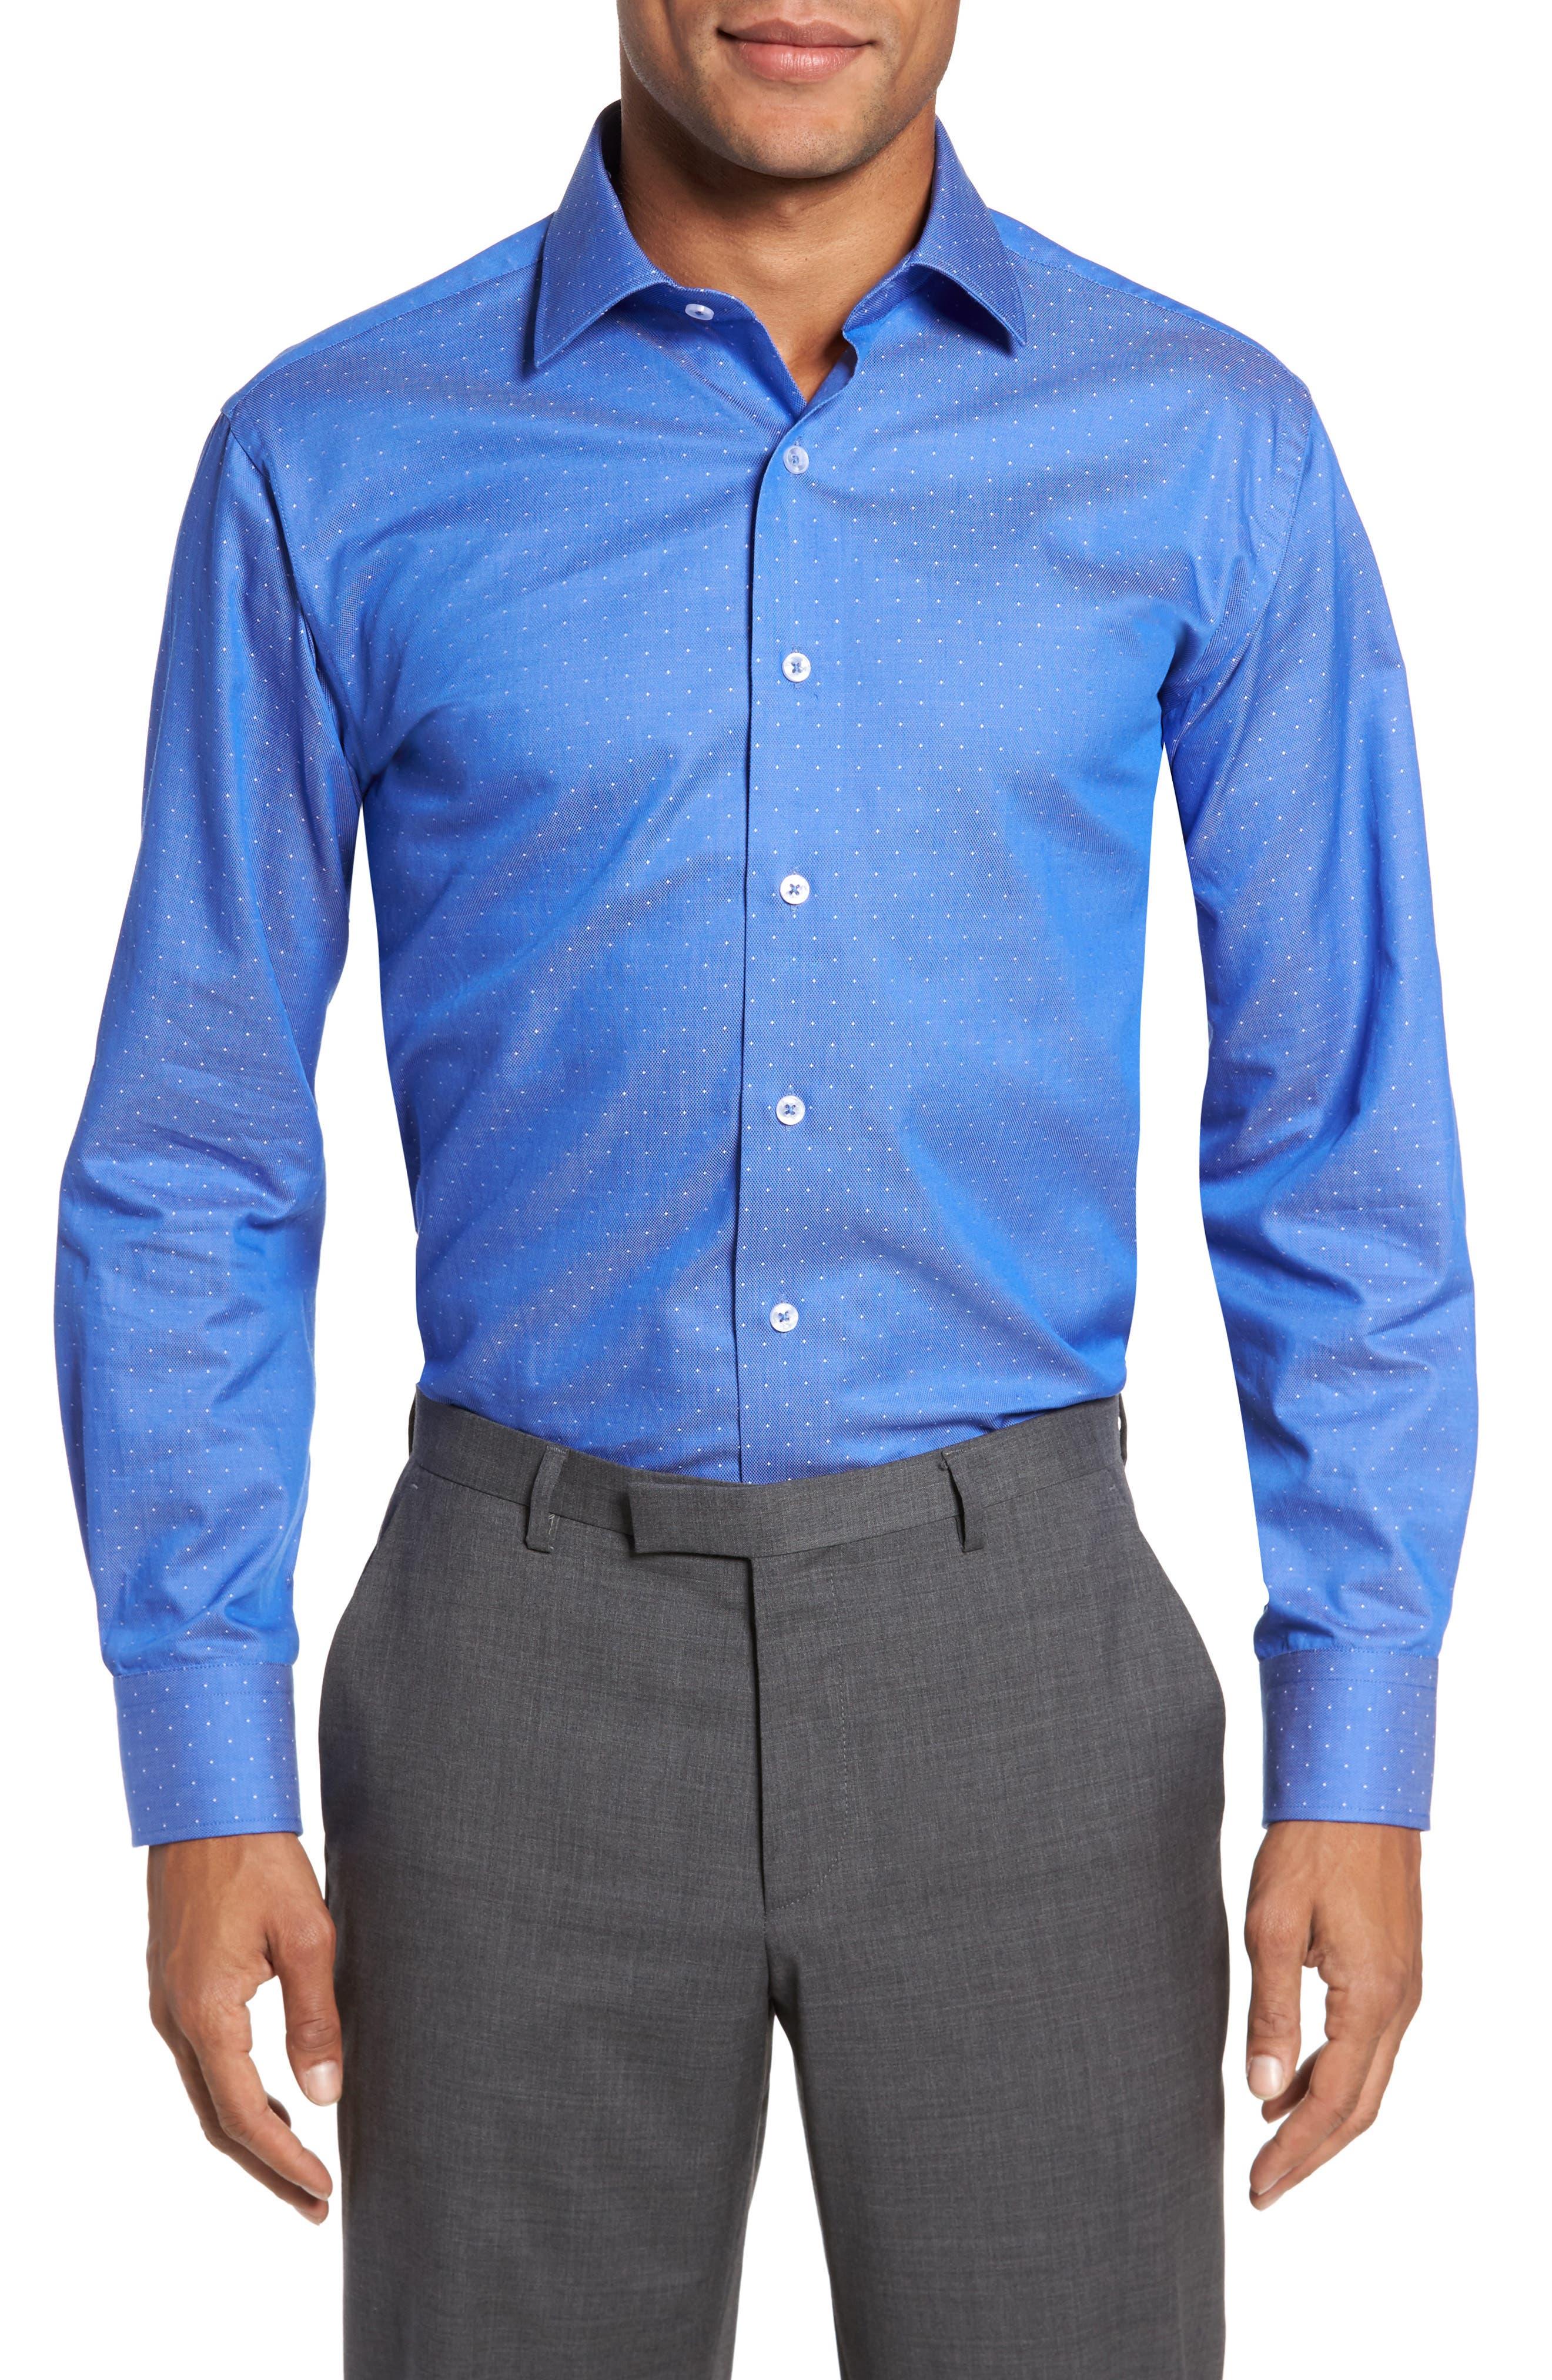 LORENZO UOMO, Trim Fit Dot Dress Shirt, Main thumbnail 1, color, ROYAL